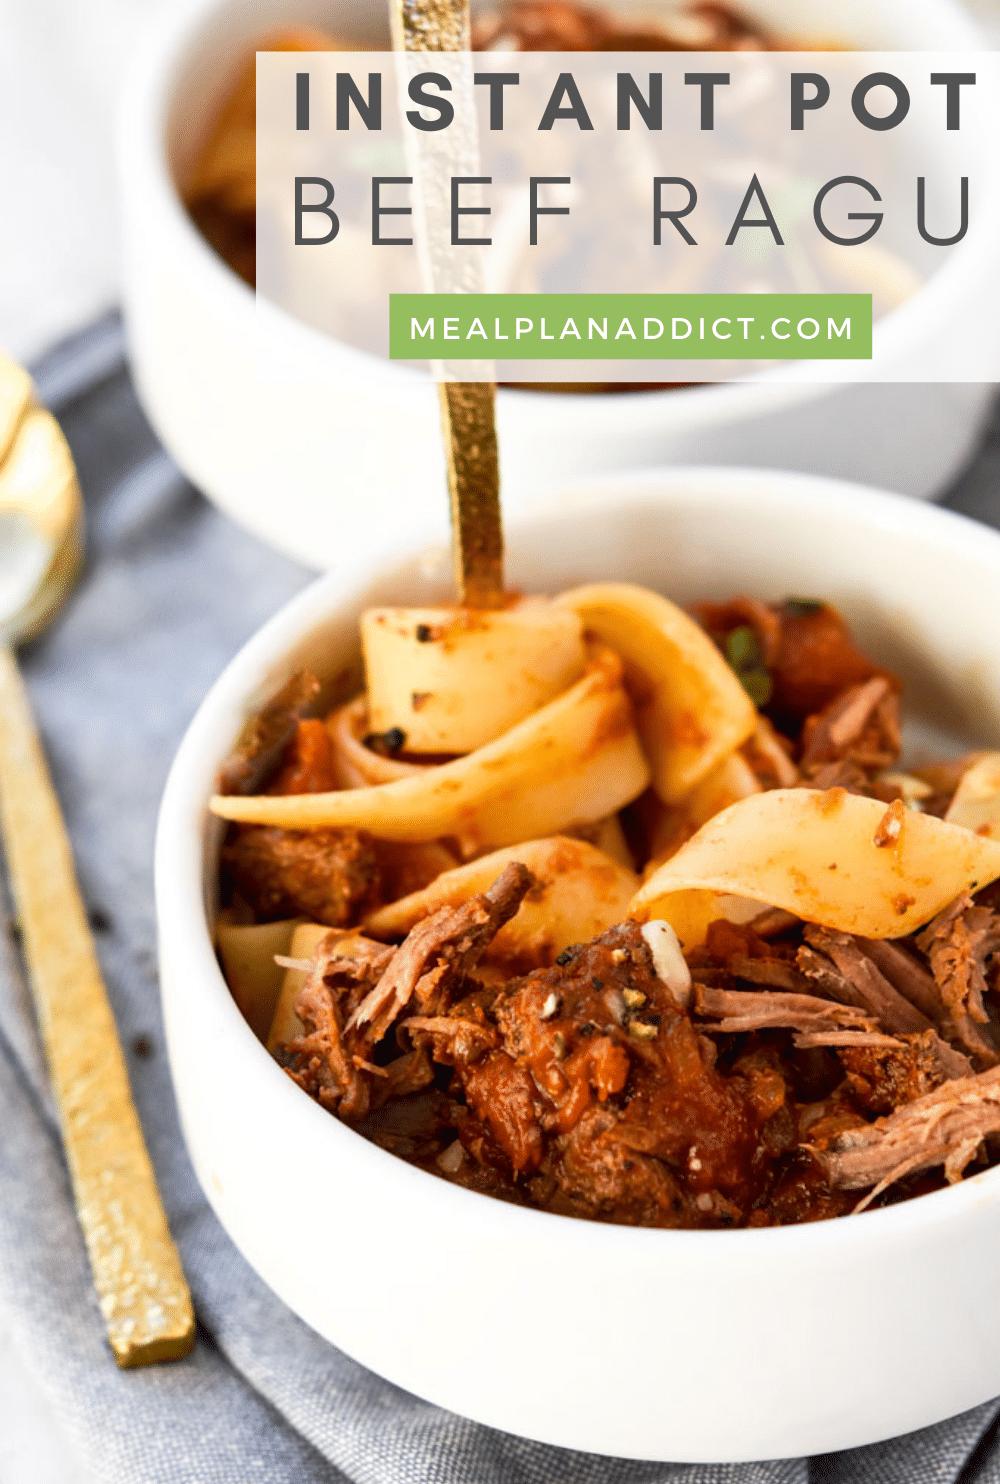 45 Minute Instant Pot Beef Ragu | Meal Plan Addict